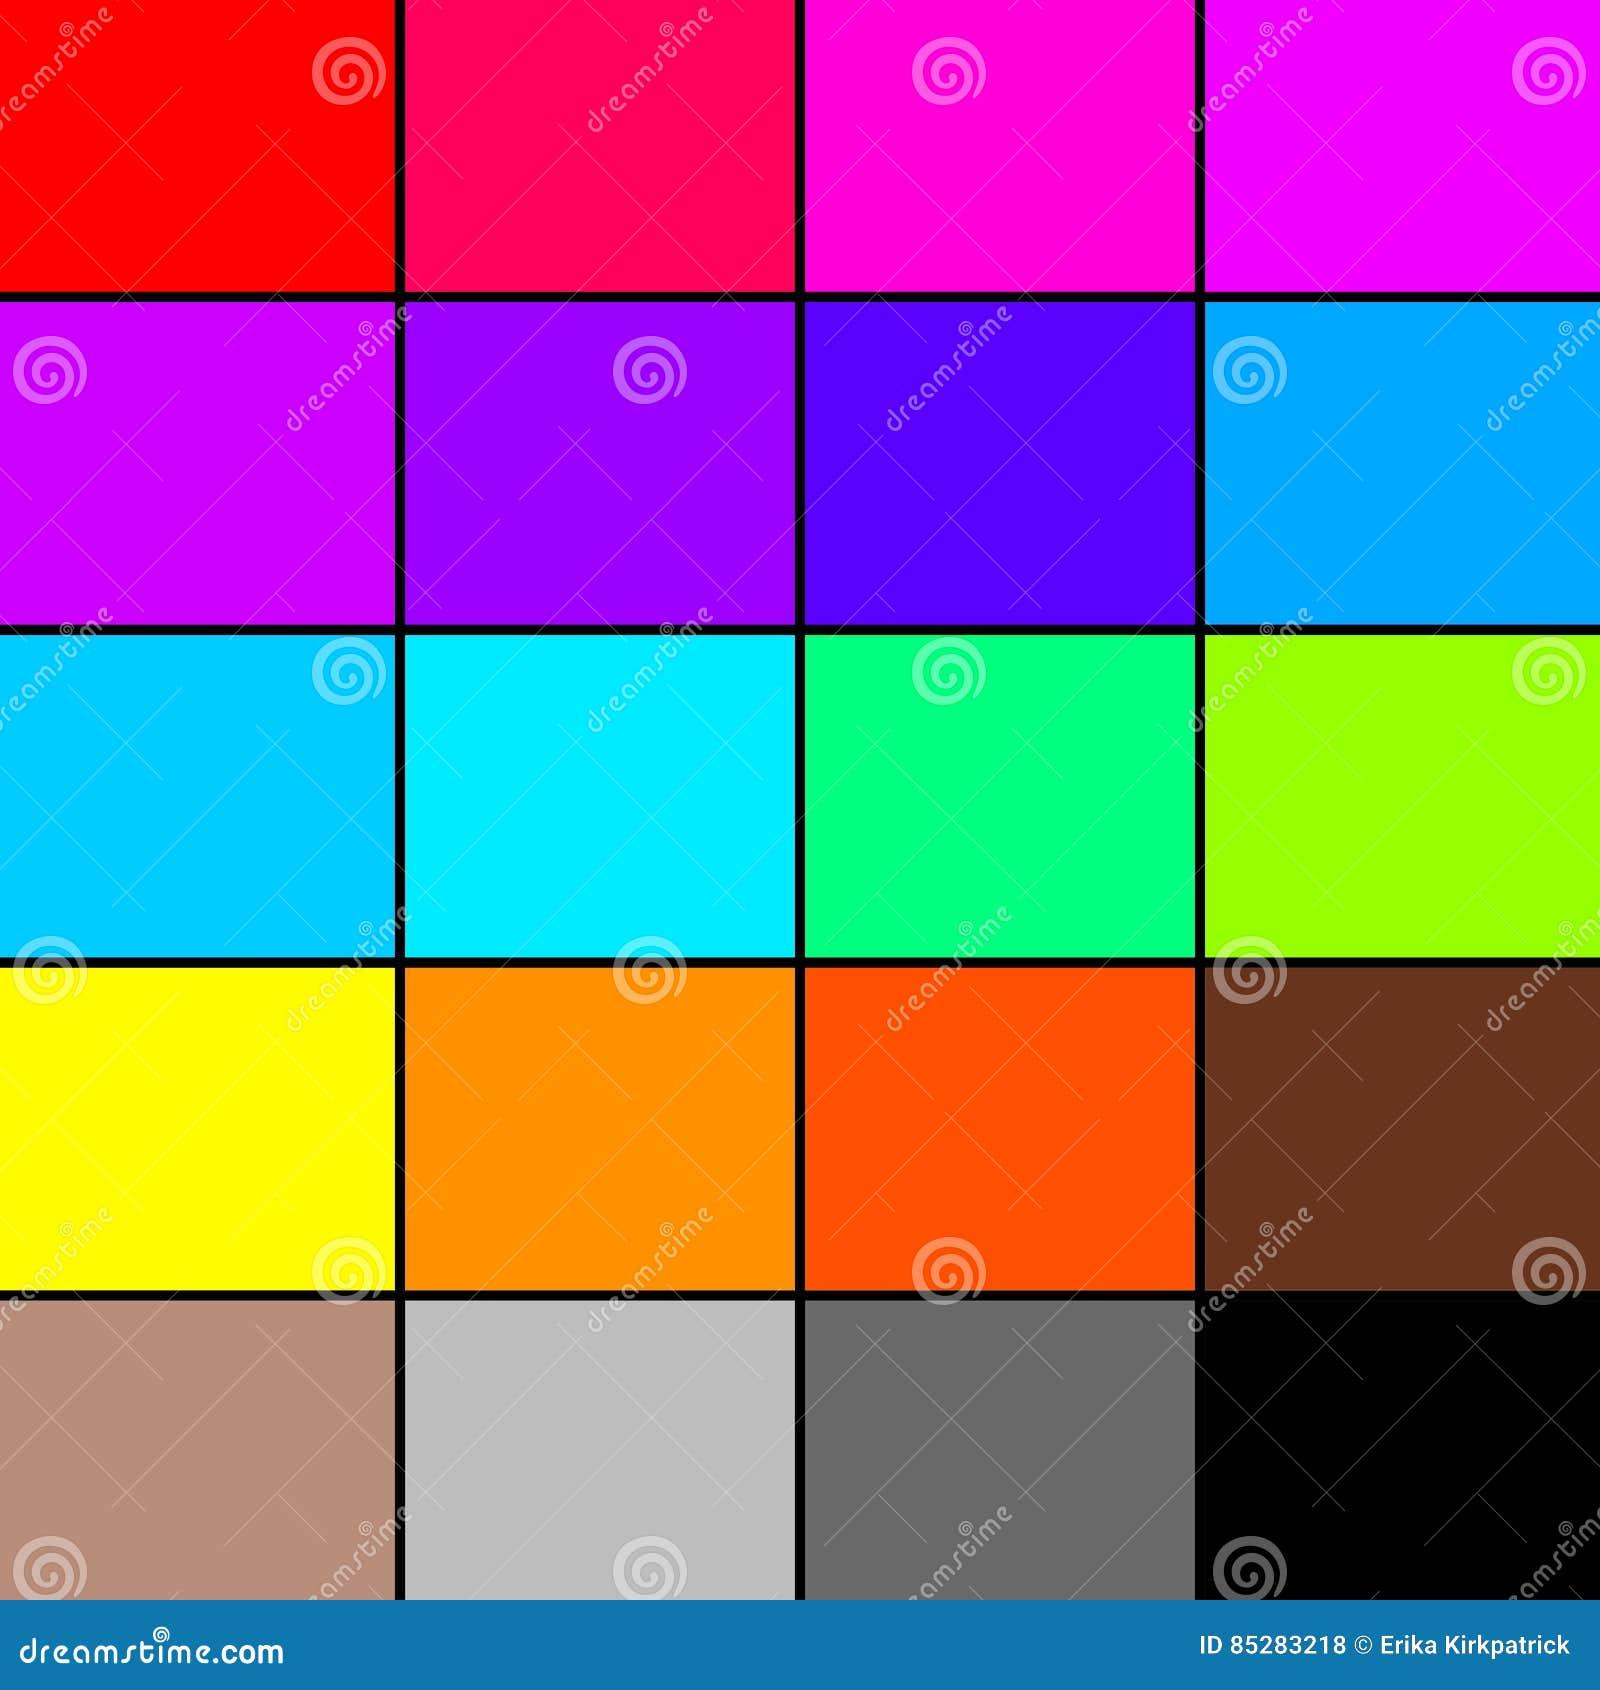 rainbow color palette stock illustration image 85283218